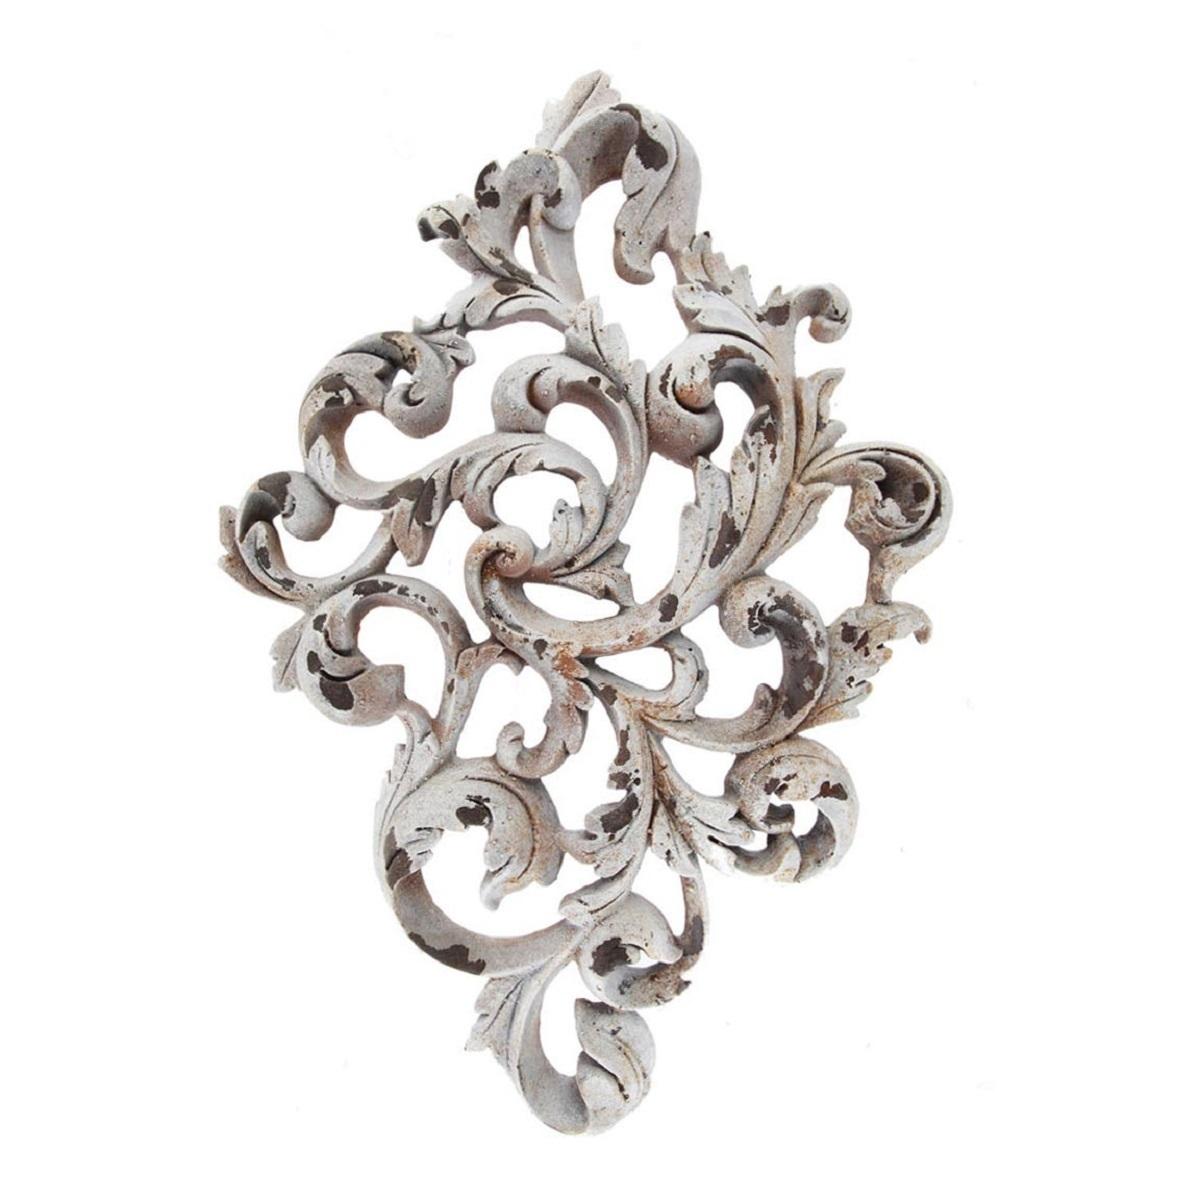 Декор Орнамент настенный Decor 86399-DAW ornament-nastennyy-decor-86399-daw-kitay.JPG